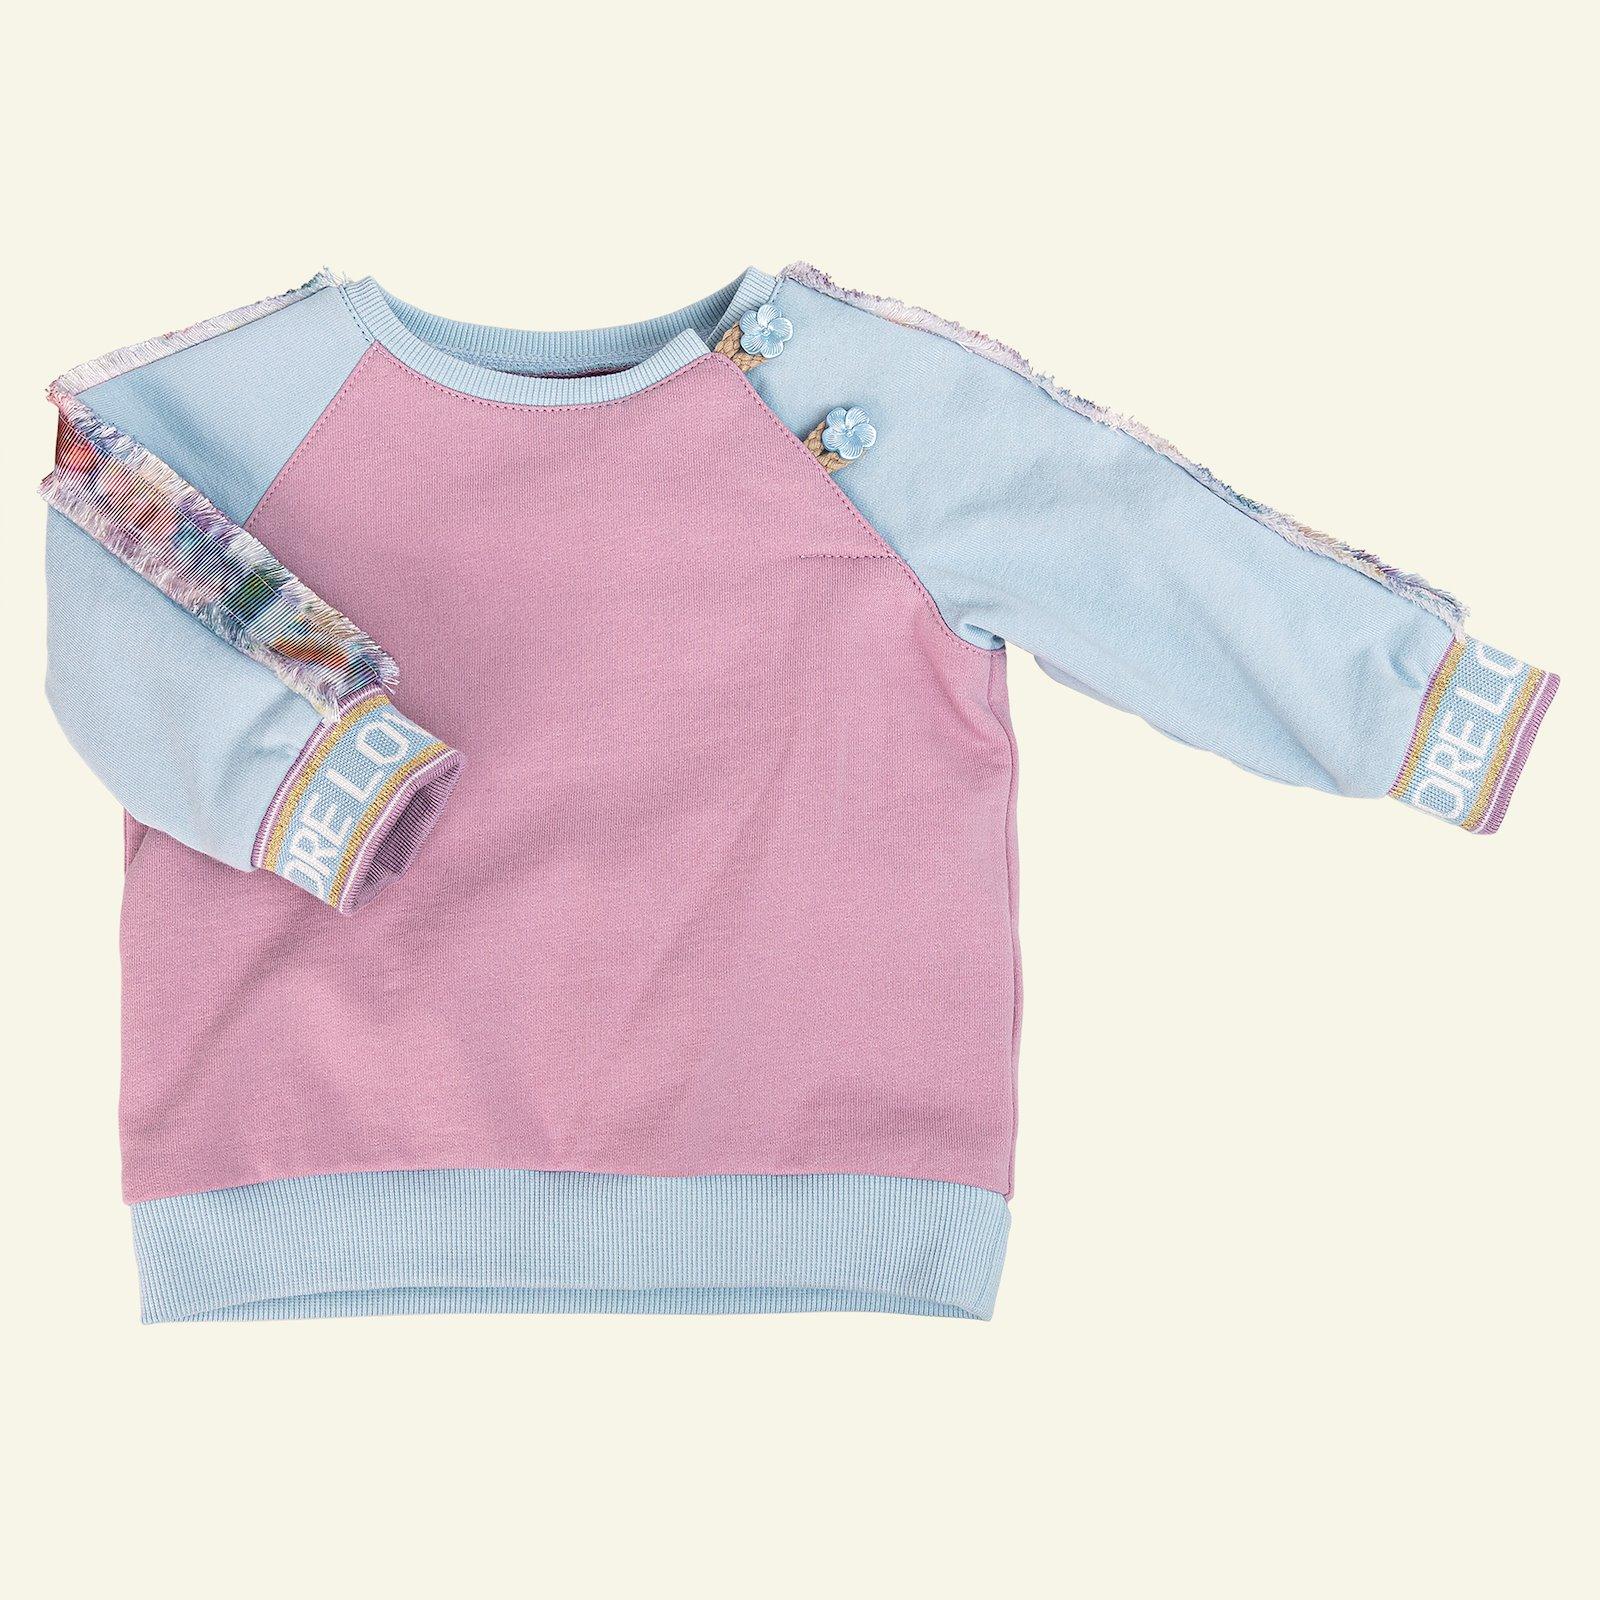 Sweatshirt and sweatpants, 98/3y p81029_211777_211778_96187_33316_96333_sskit